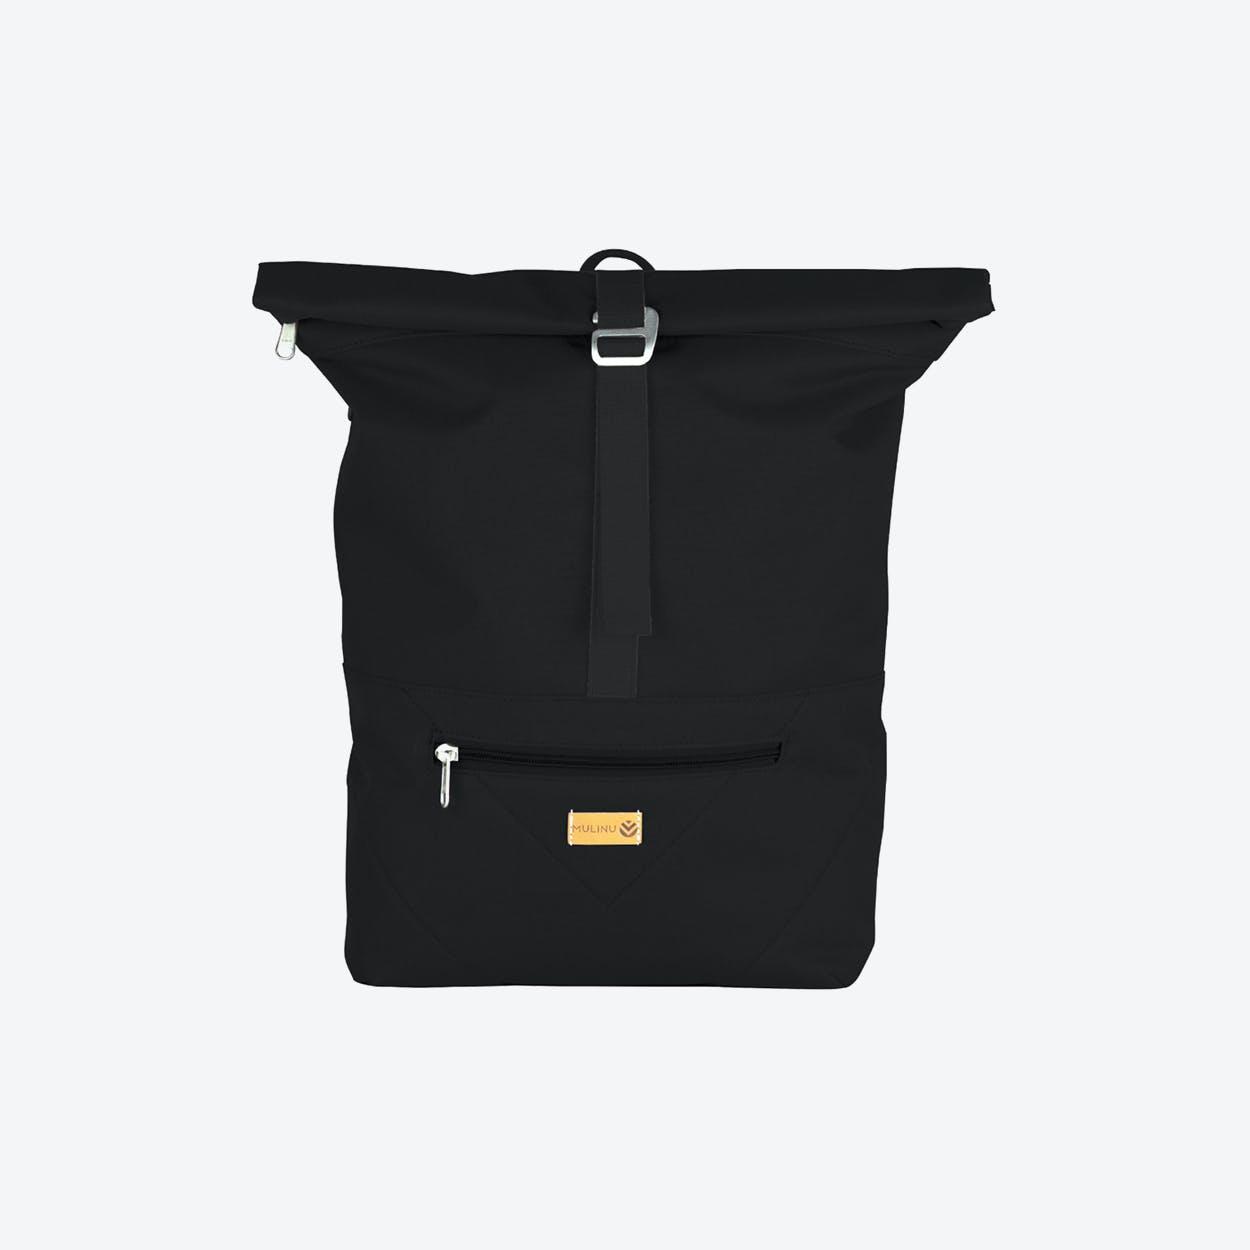 CLASSIC ALBERT 2 Black